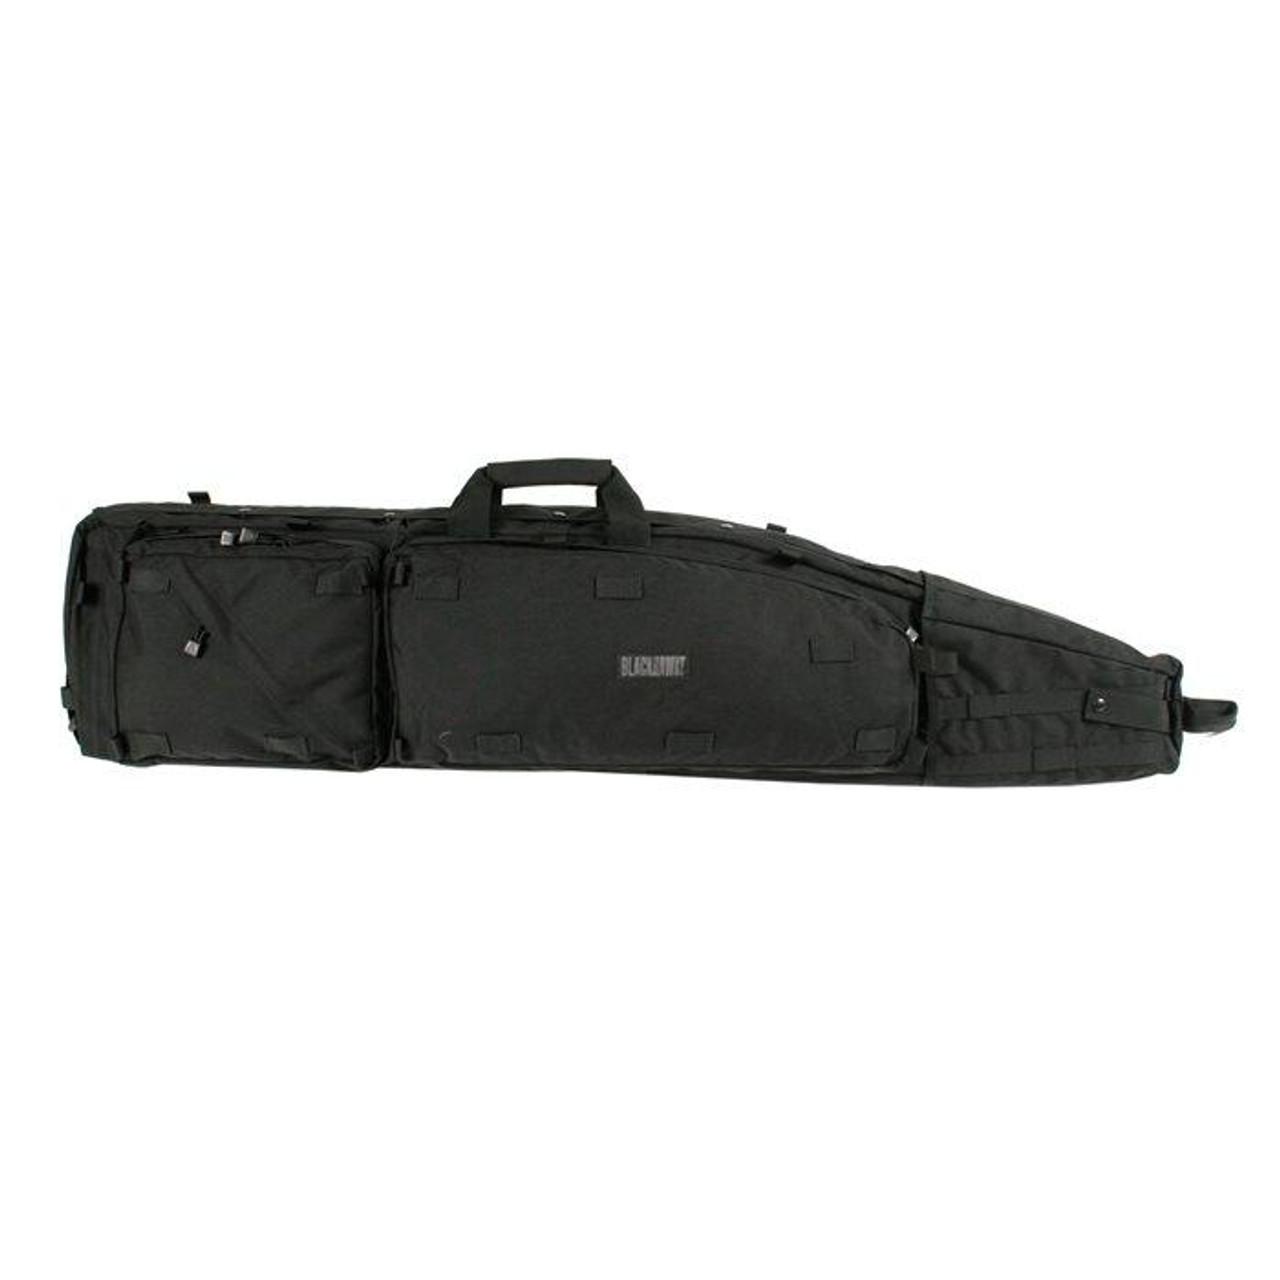 BLACKHAWK - LONG GUN SNIPER DRAG BAG